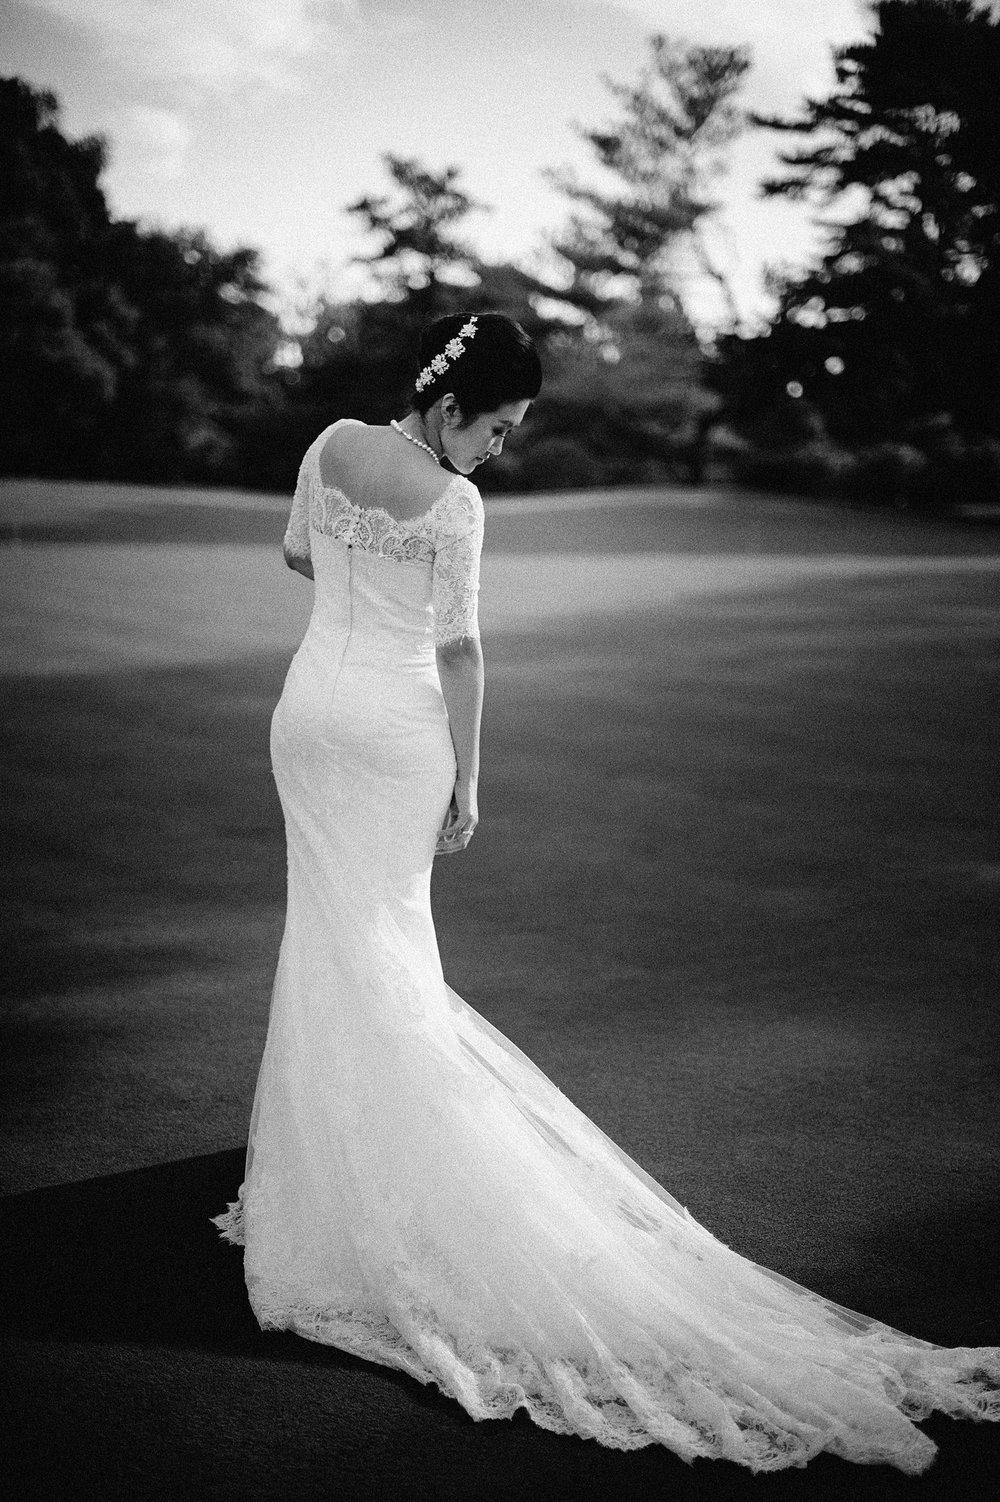 Chris_Hui_婚禮_婚紗照_pre_wedding_photography_best_063_.jpg